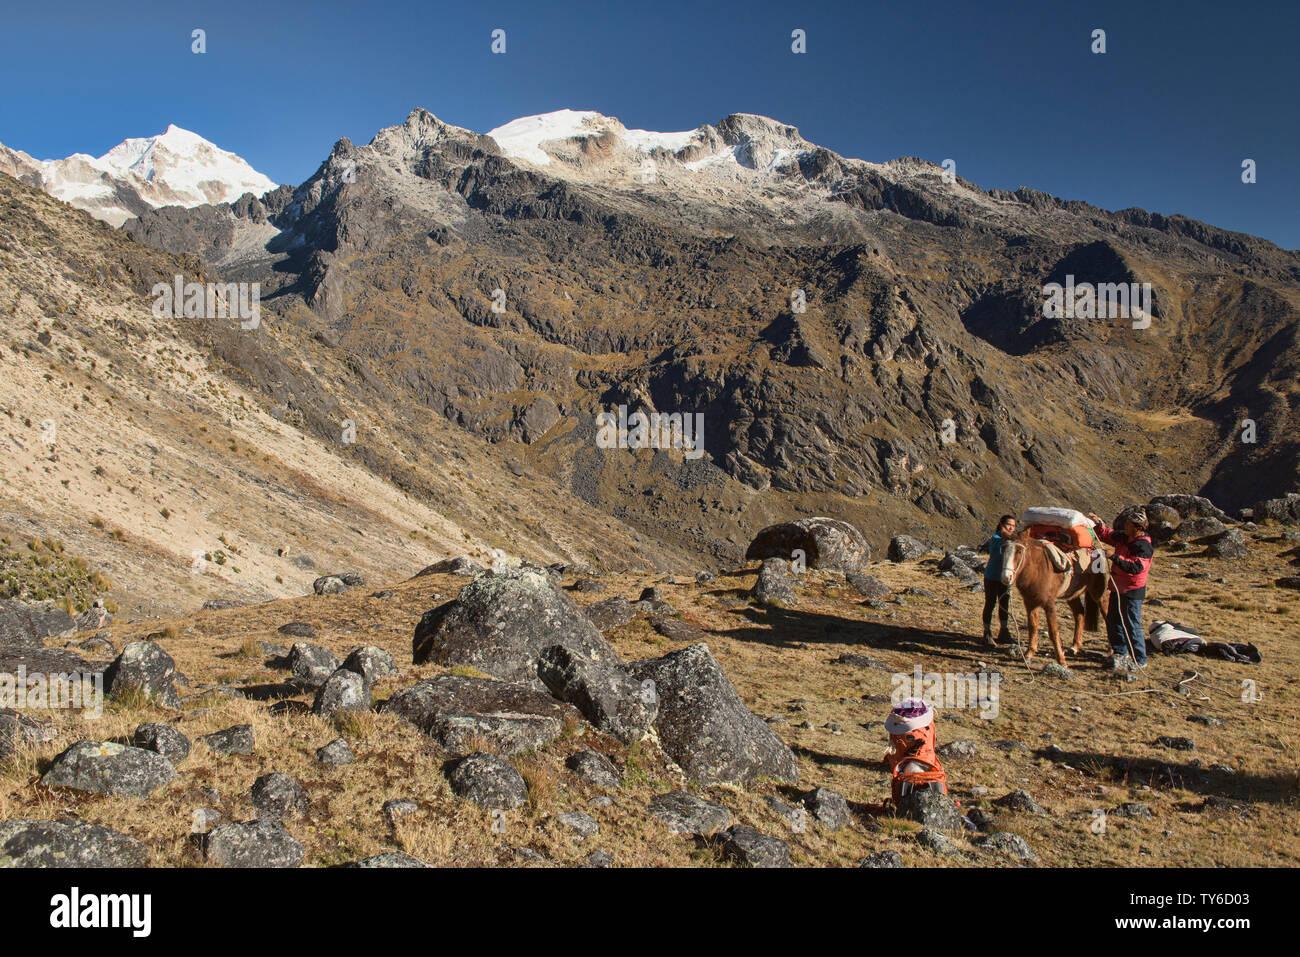 Loading the horses, Cordillera Real Traverse, Bolivia - Stock Image